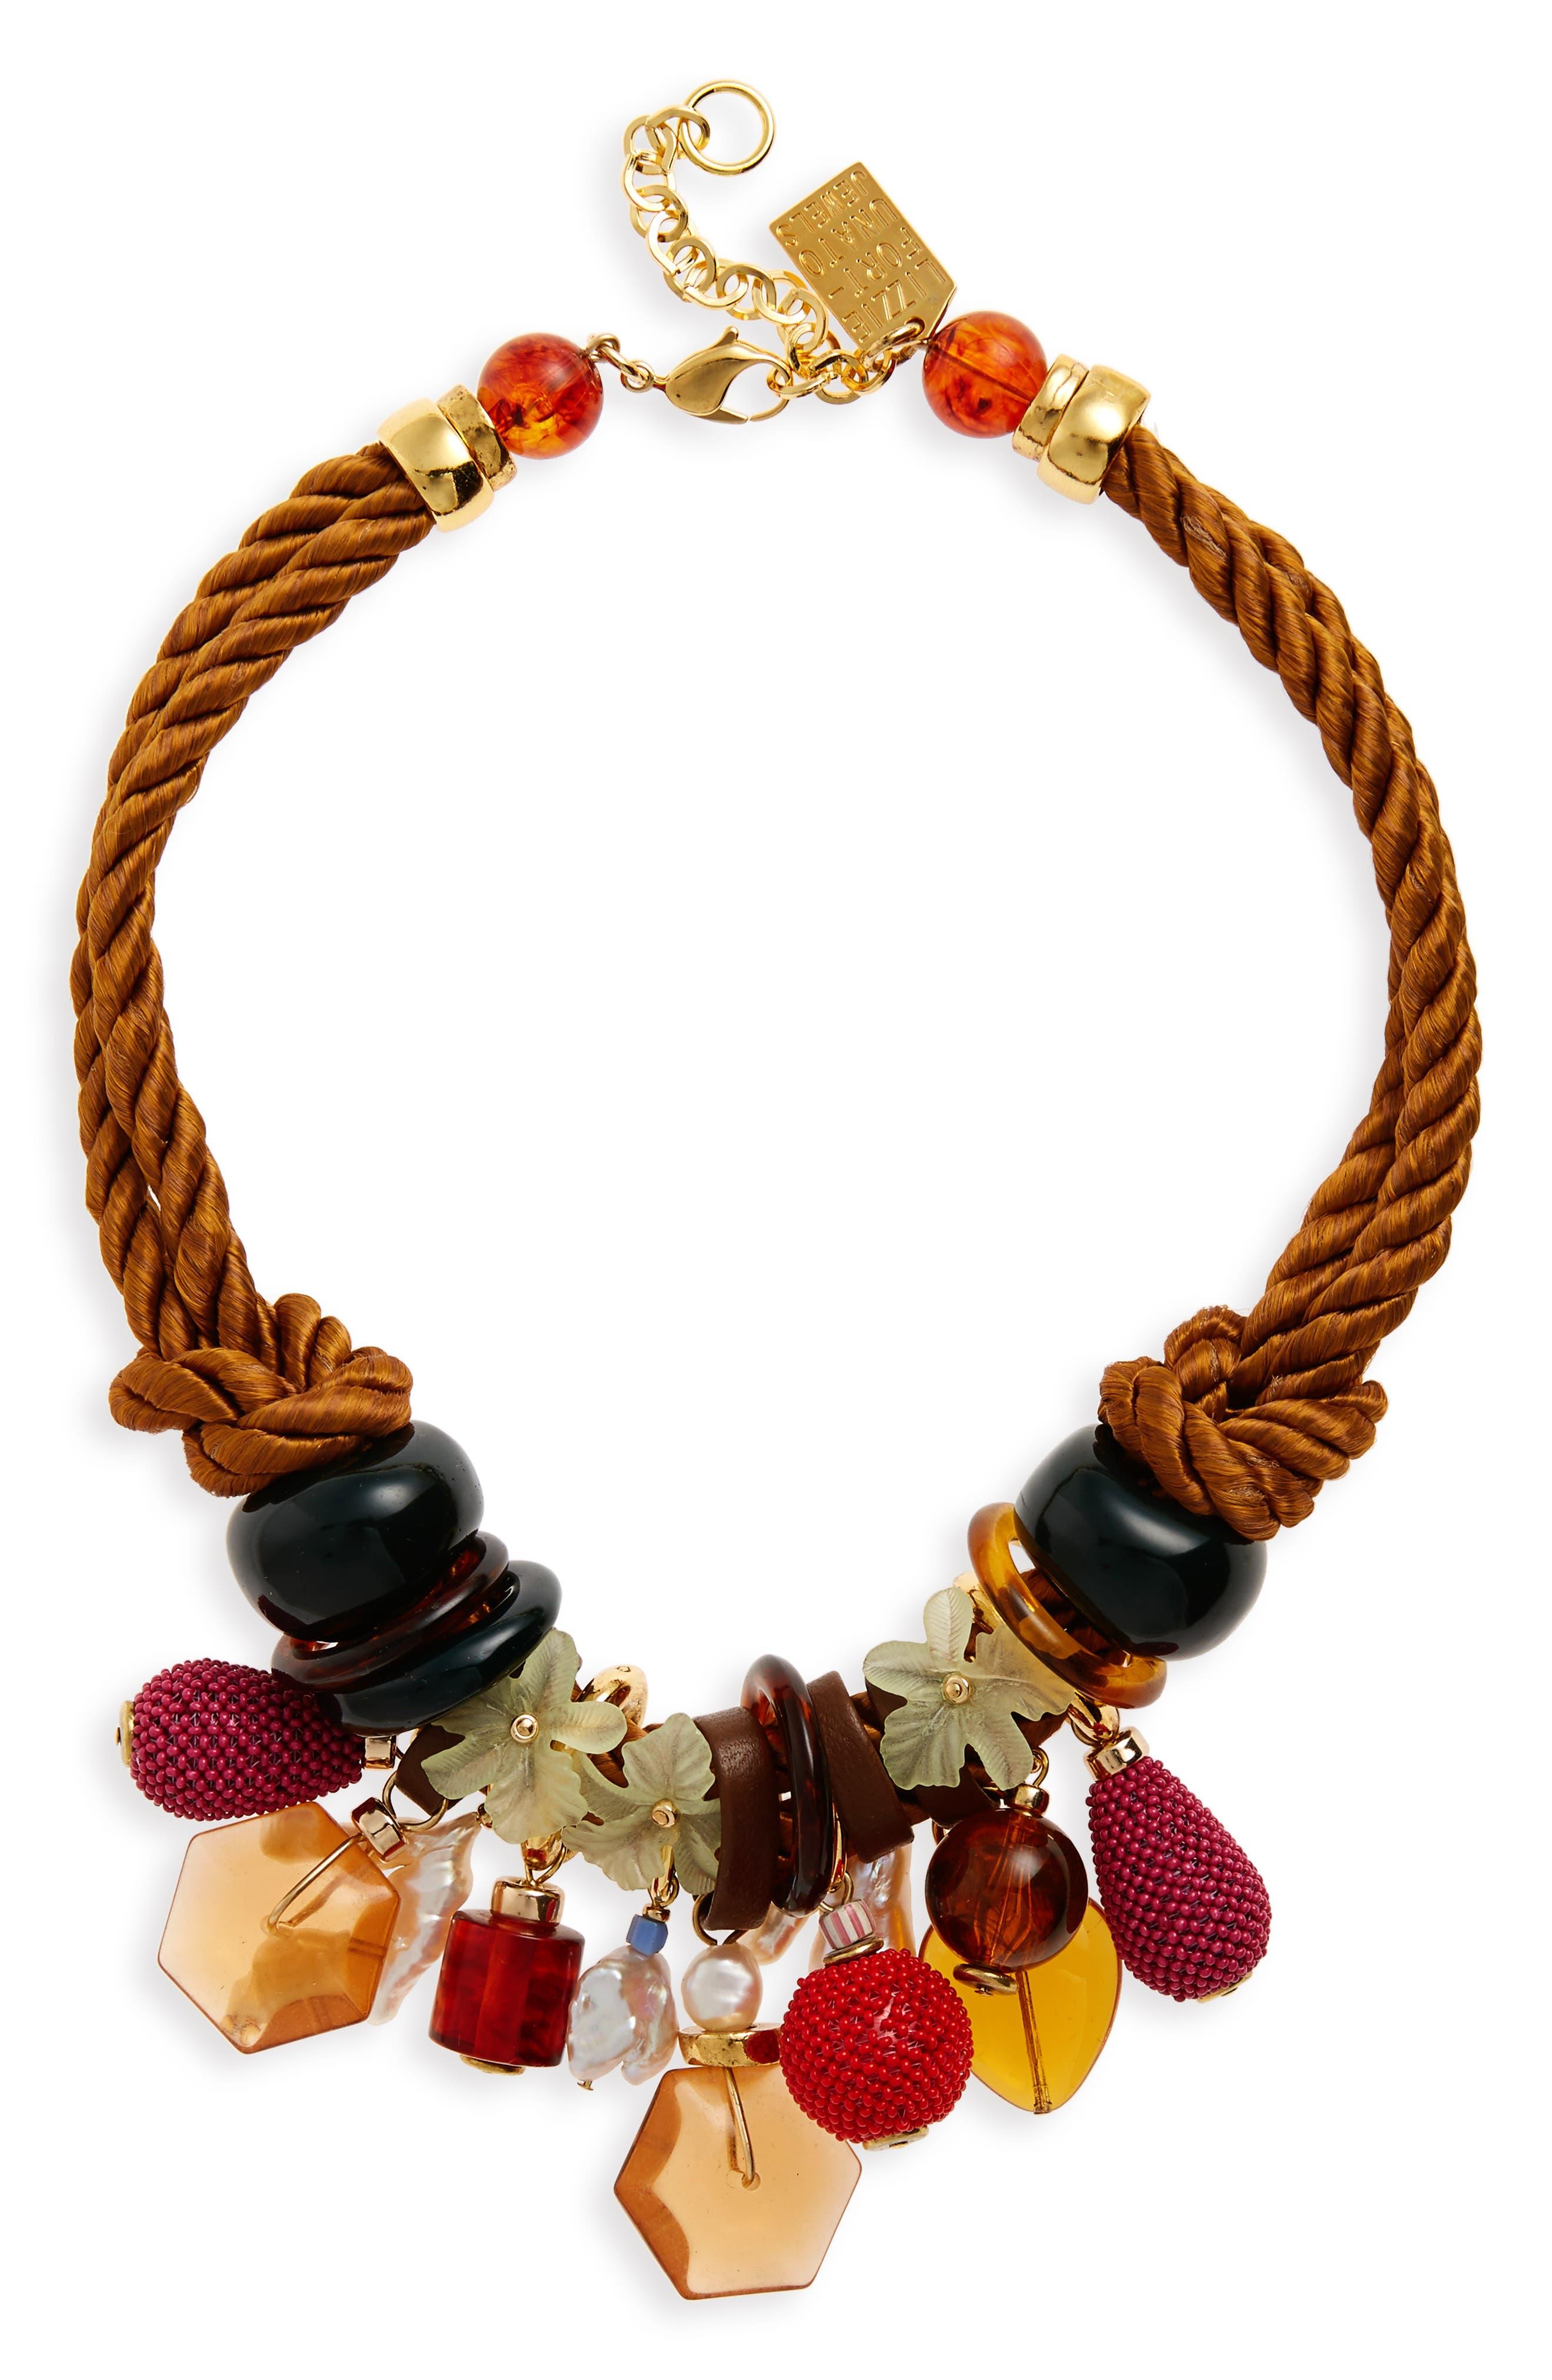 Tropicana Charm Necklace,                             Main thumbnail 1, color,                             250